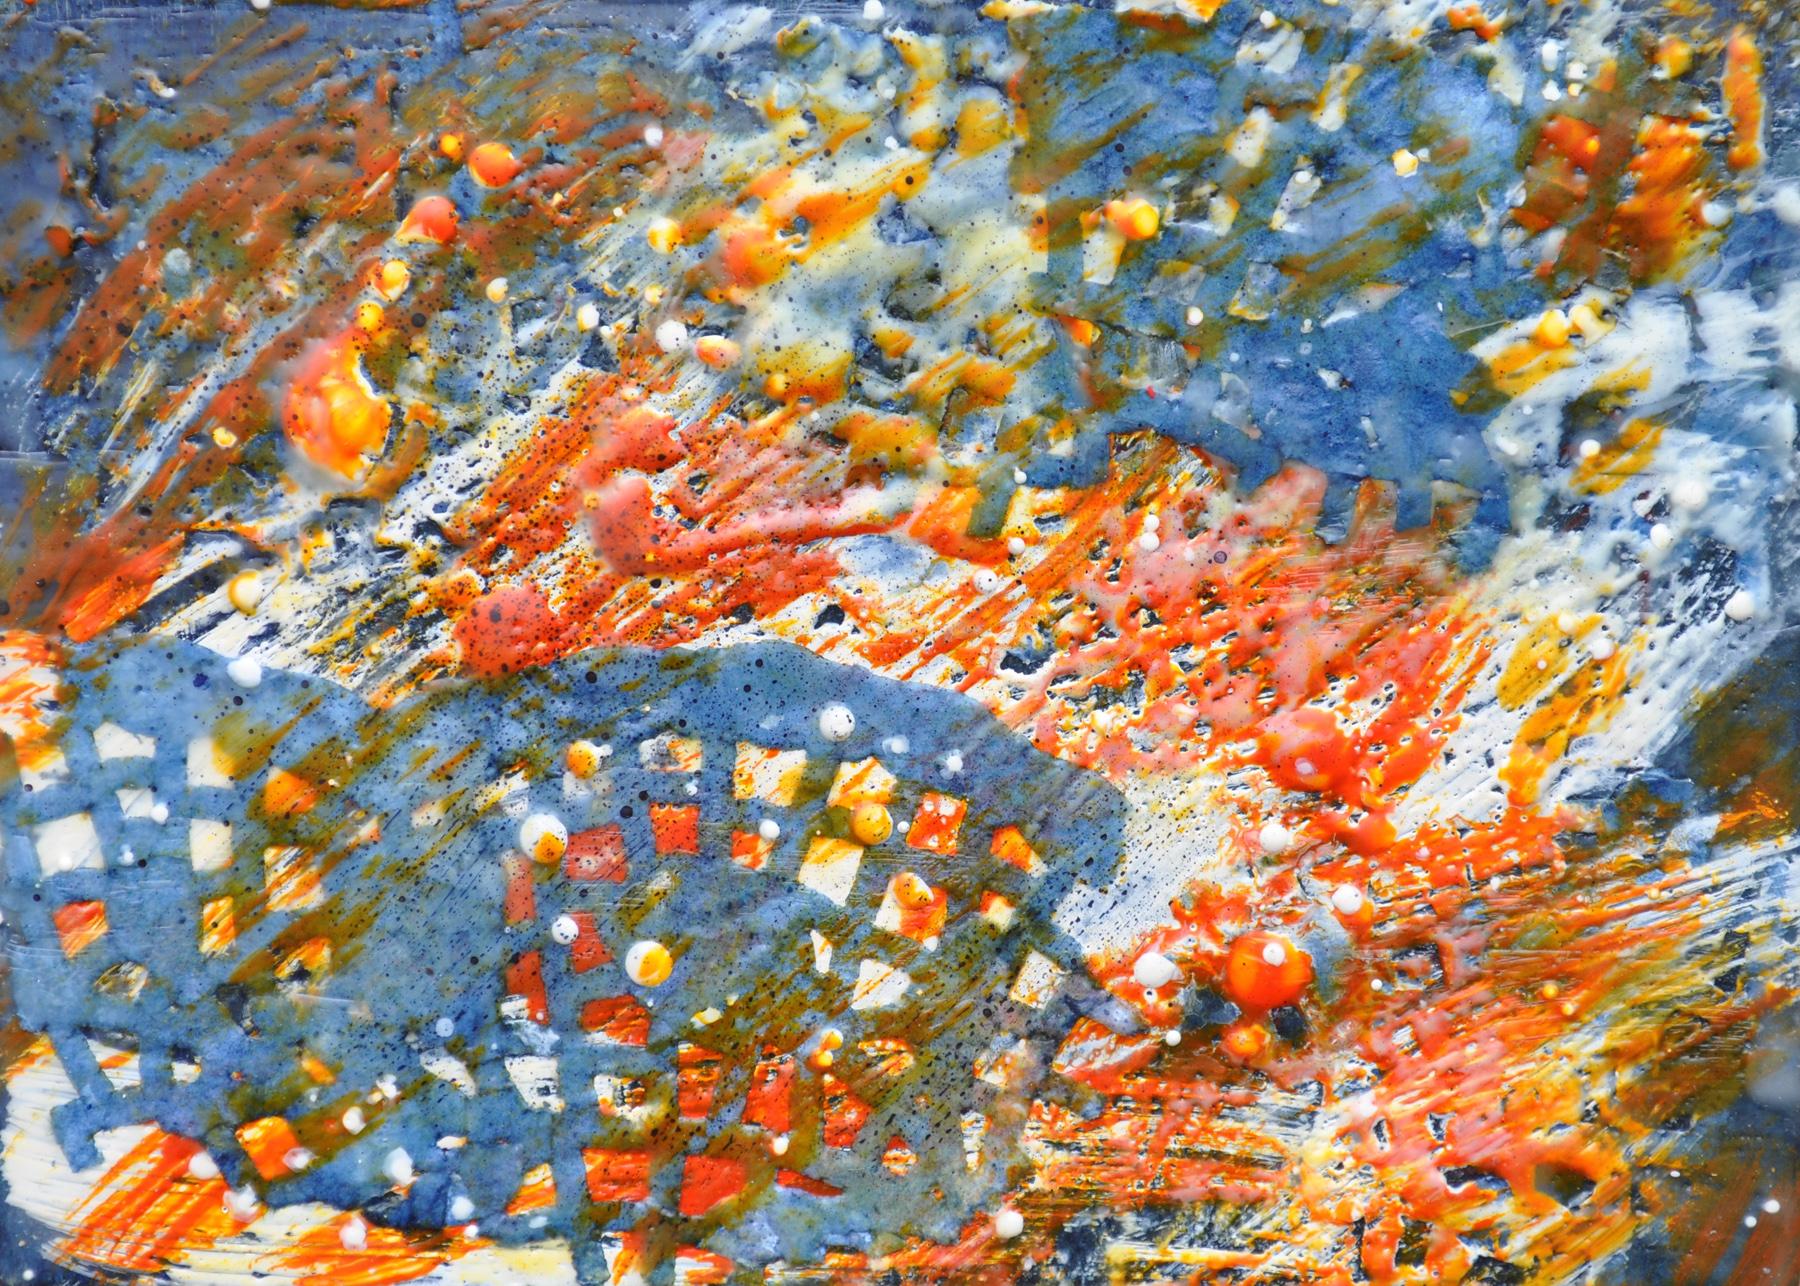 "La Alborada #2 (The Dawn #2) encaustic, indigo-dyed paper, 7x5"""